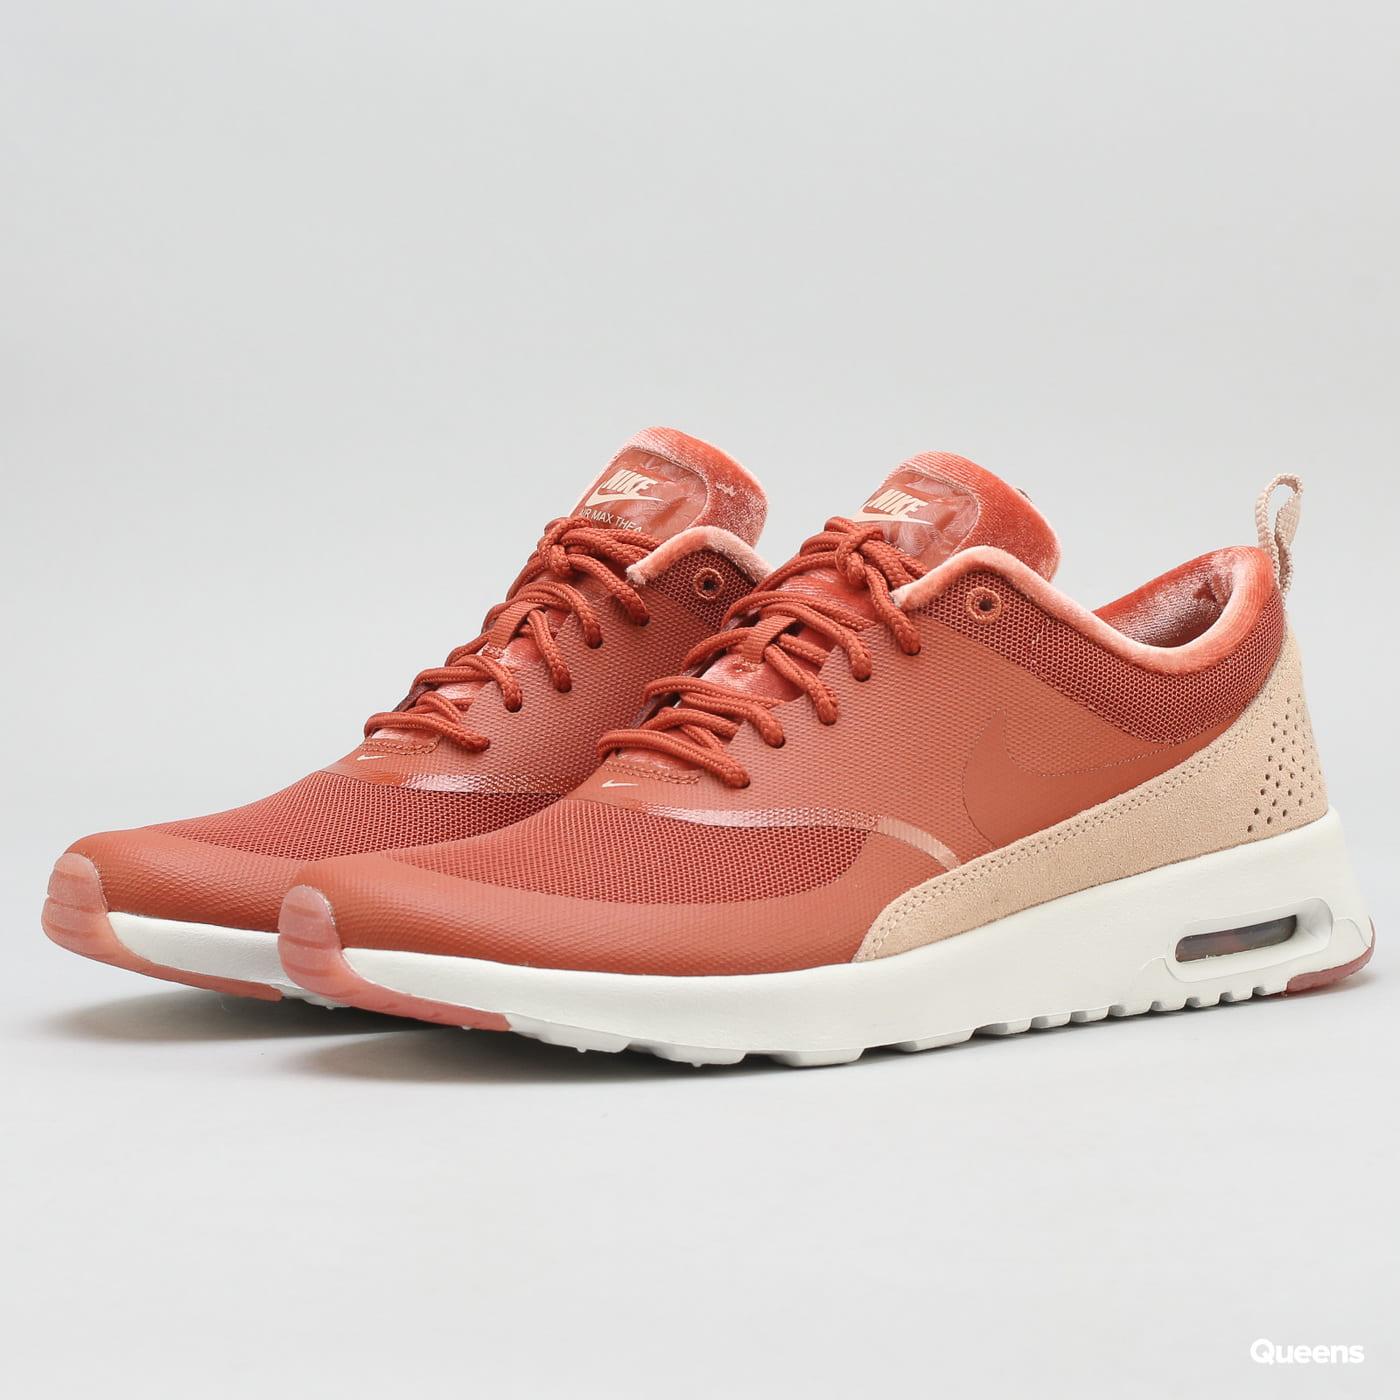 mejor precio para Tienda online mejor sitio web Nike WMNS Air Max Thea LX dusty peach / dusty peach (881203-201) – Queens 💚